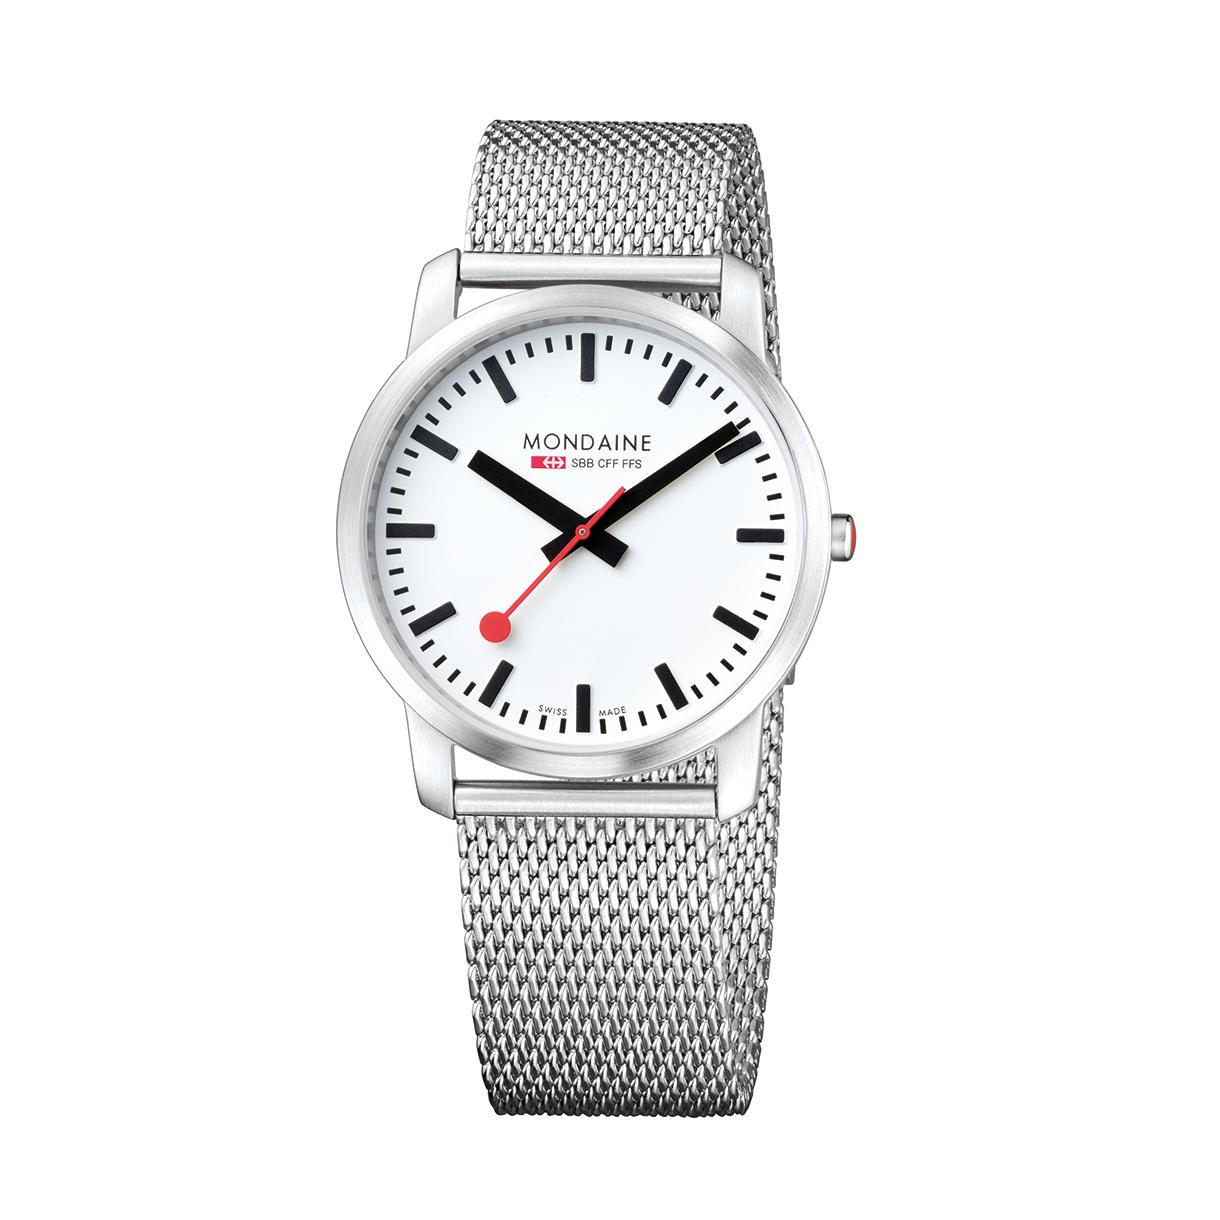 Mondaine Simply Elegant Mondaine Watches Clocks